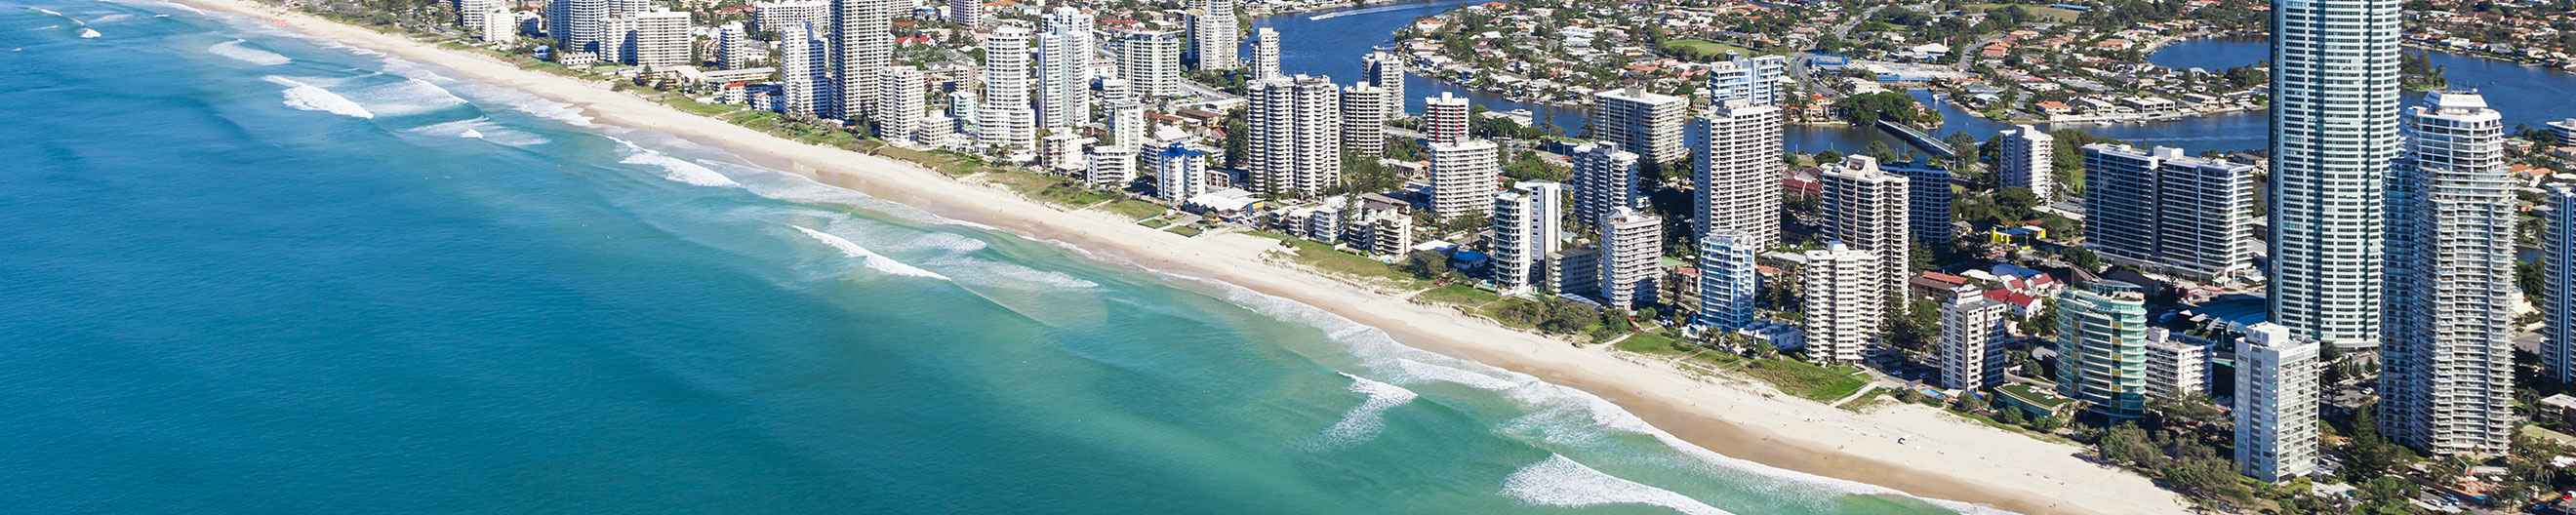 Broadbeach, Gold Coast Travel Guide | Meriton Suites